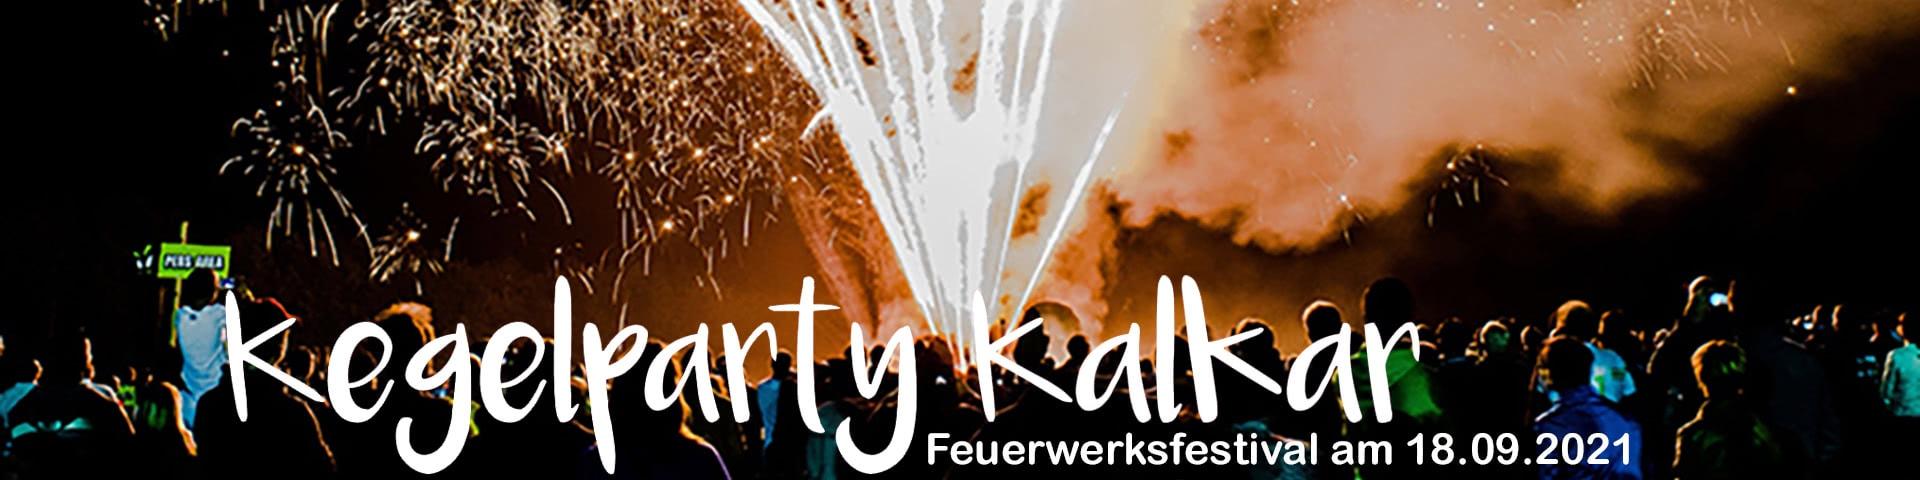 Kegelparty Kalkar Feuerwerksfestivak am 17.09.2021